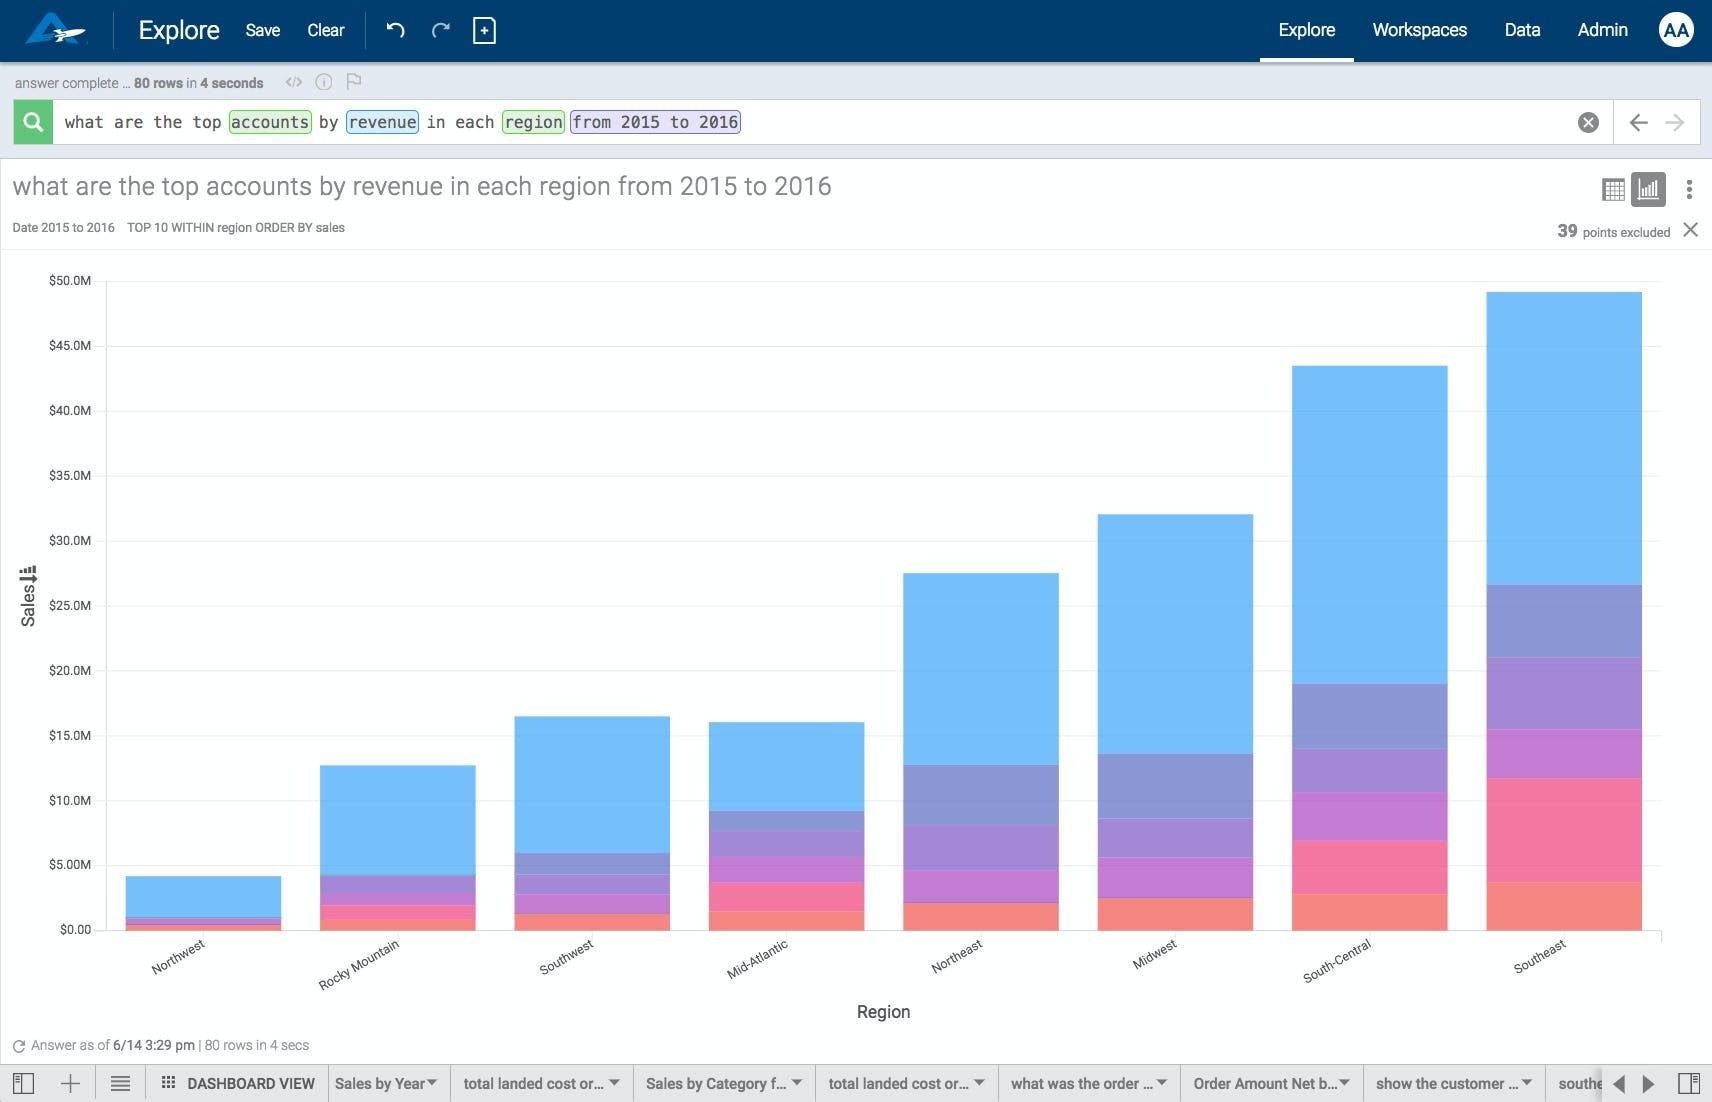 AnswerRocket Software - Bar chart